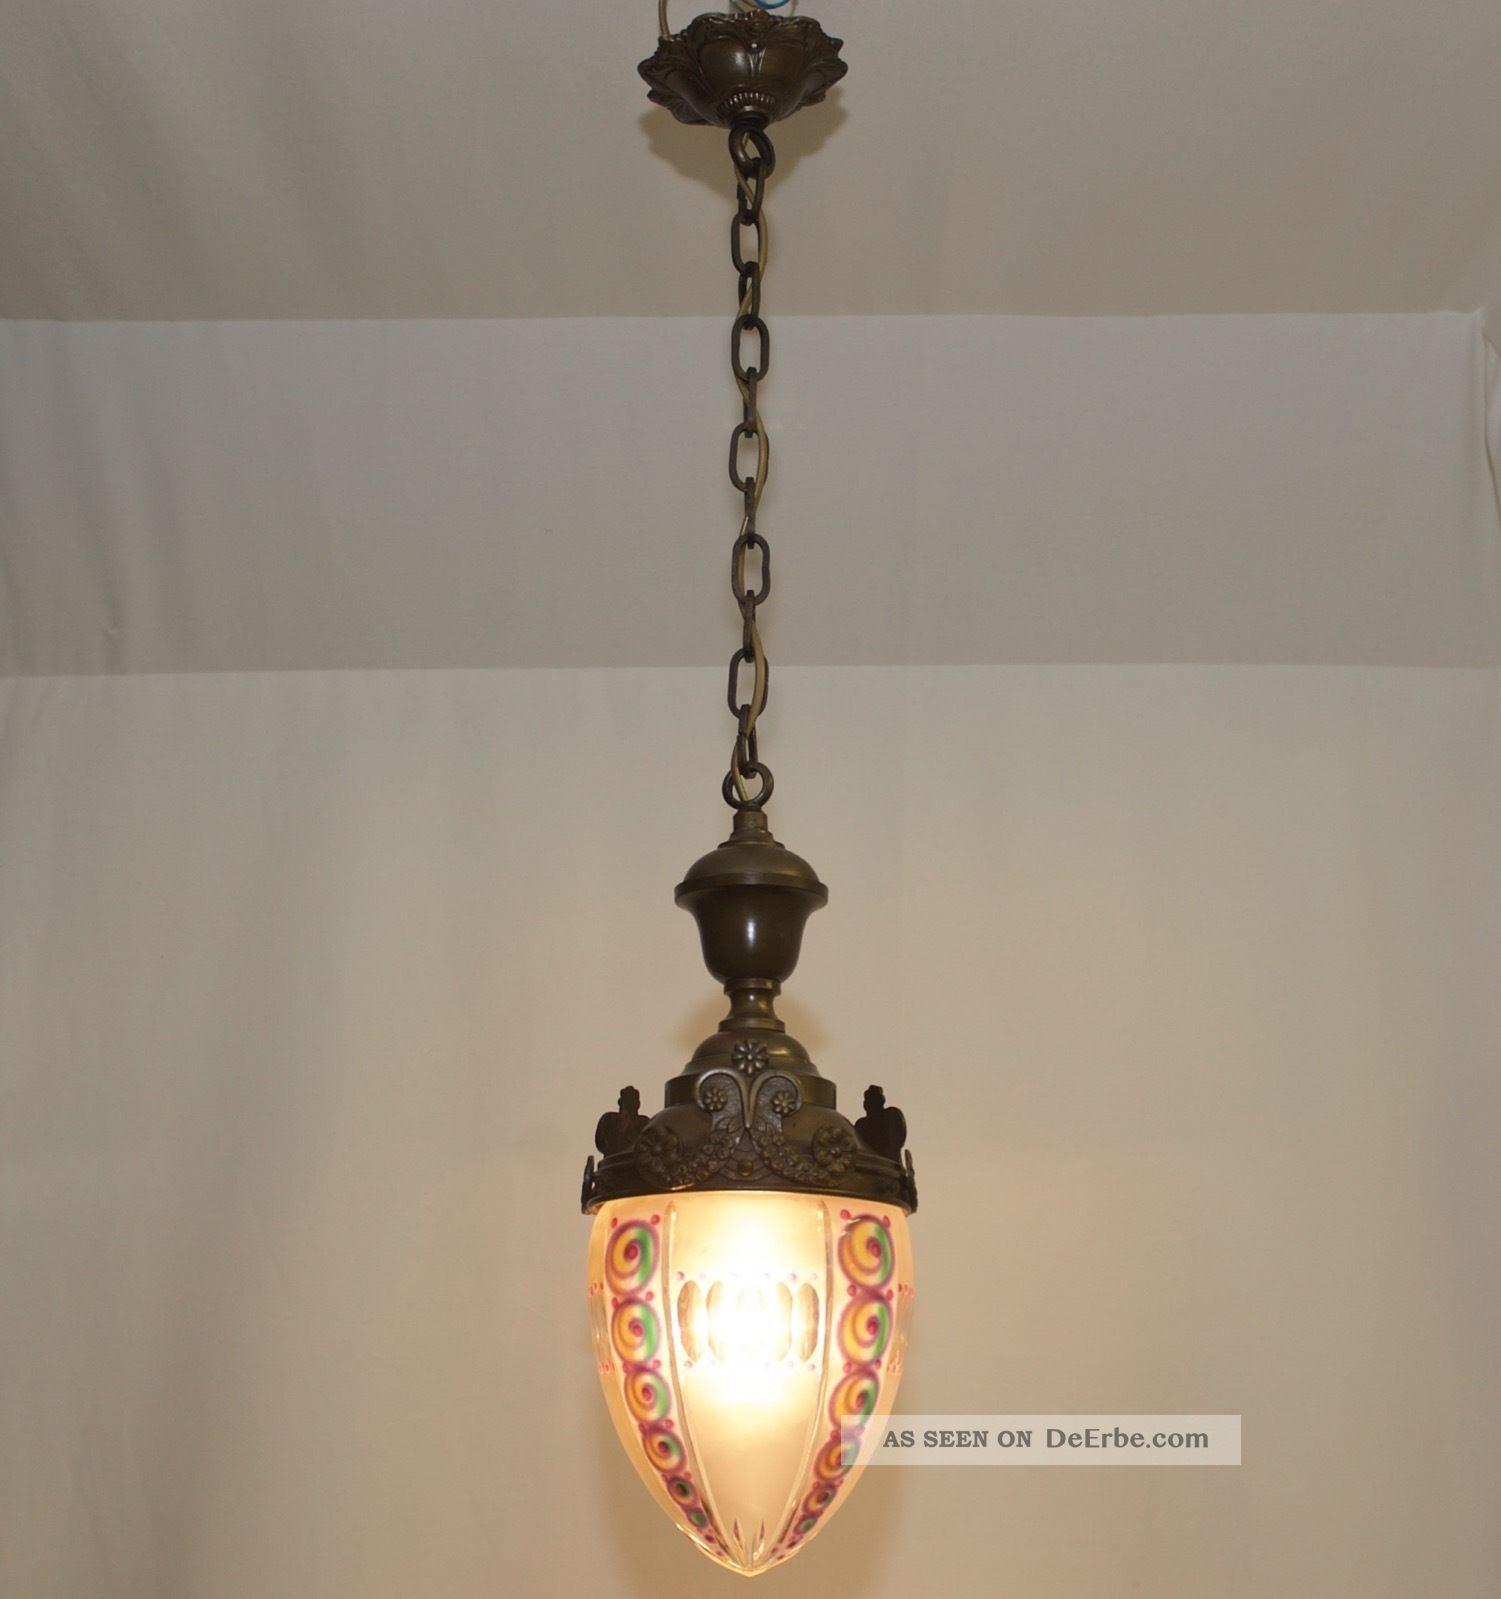 rarität um 1920 art deco nouveau lampe deckenlampe